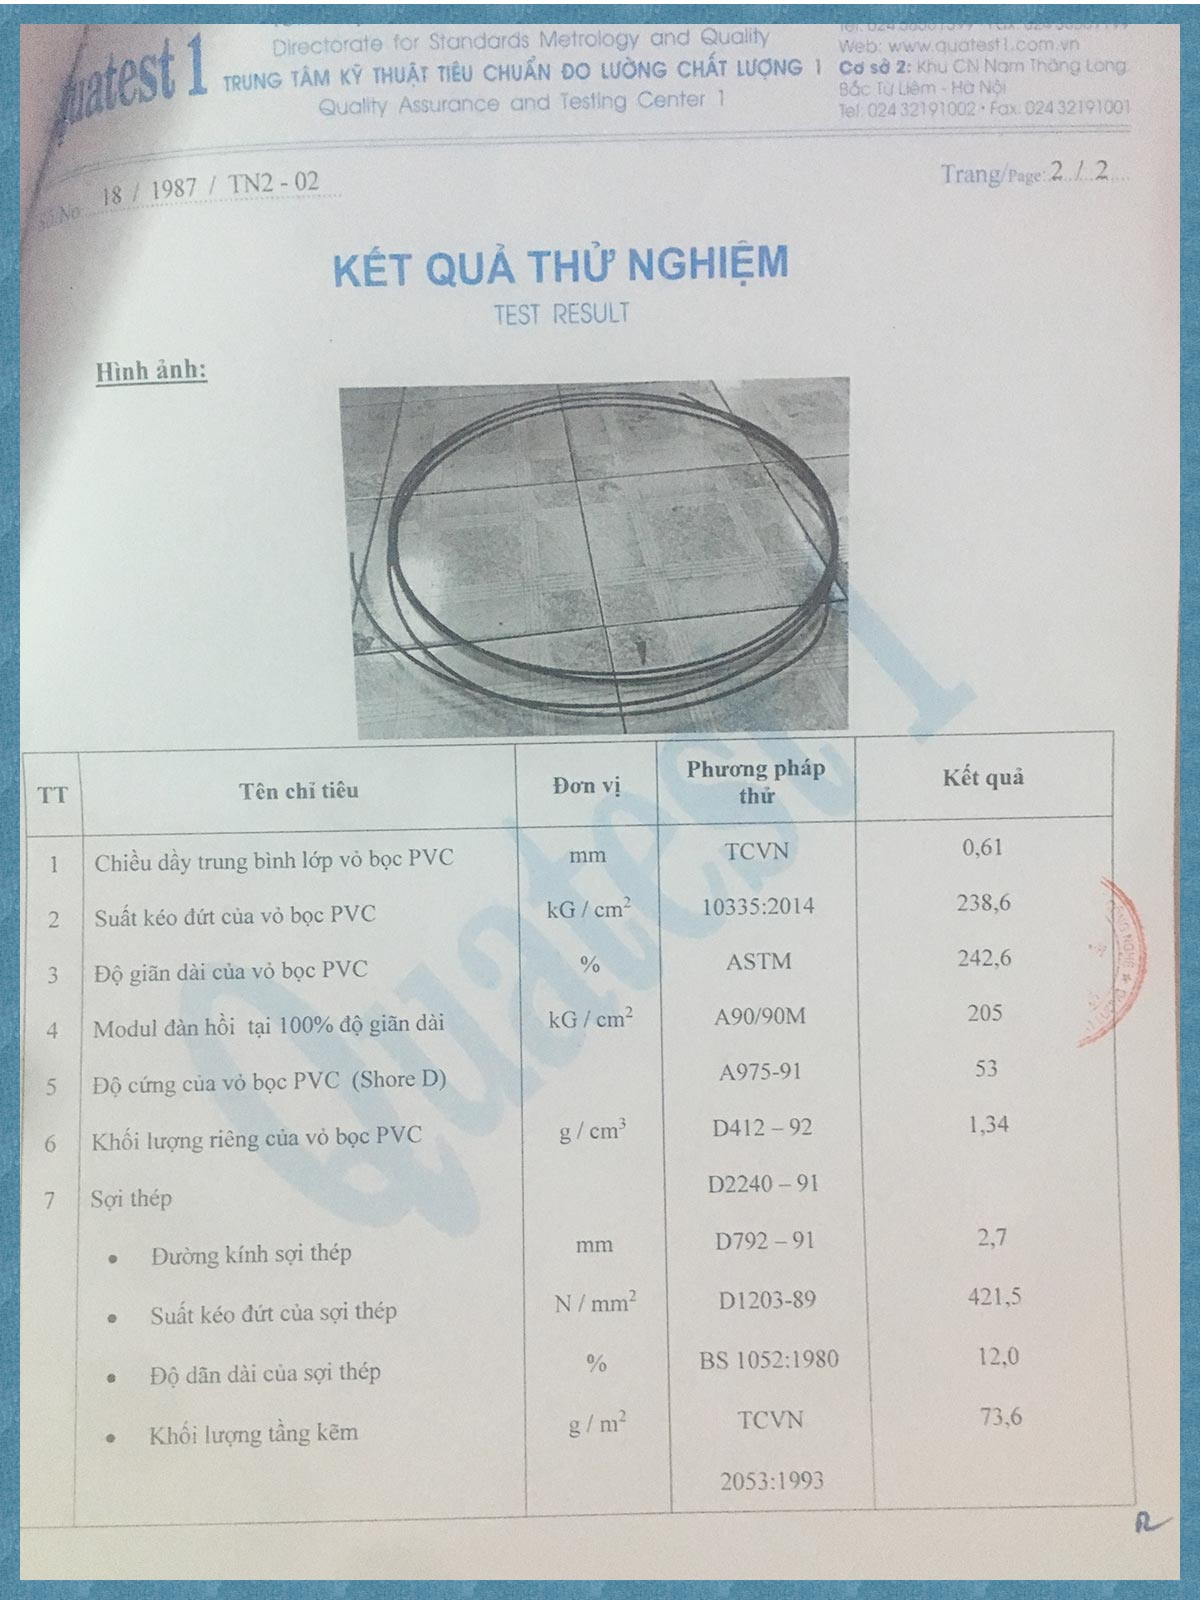 chungchi-ket-qua-thu-nghiem03